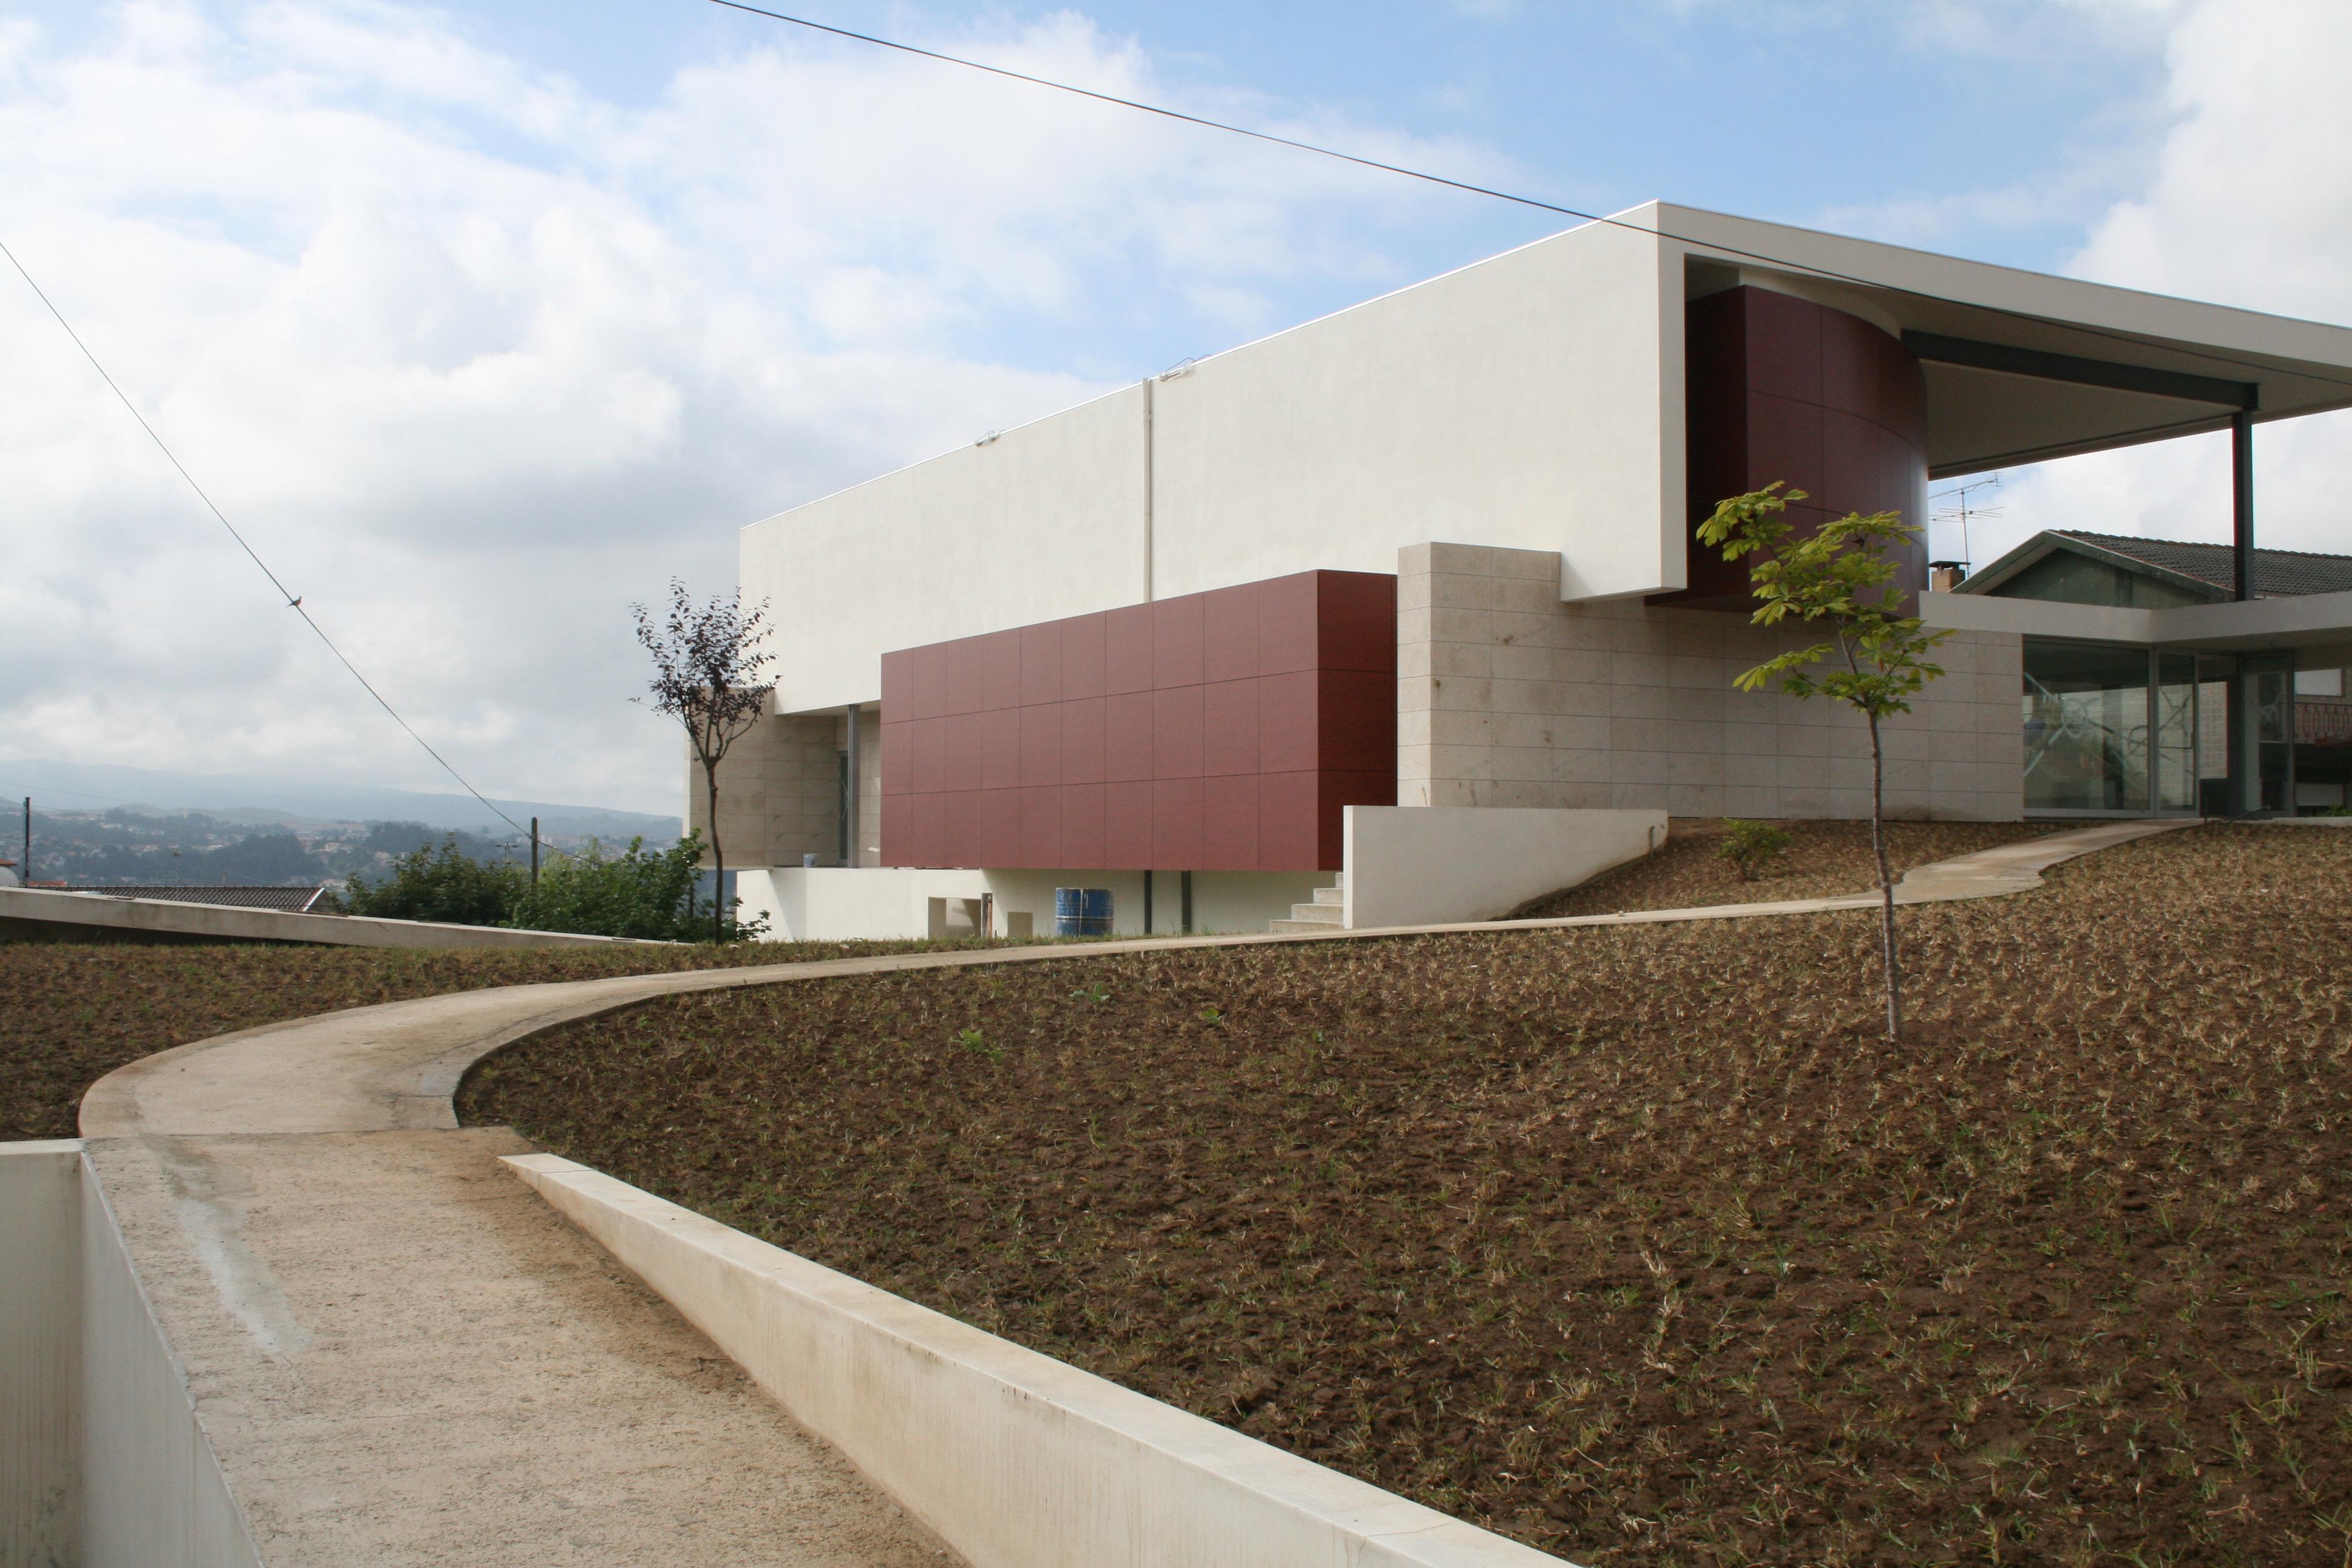 Centro Cultural de Cucujães